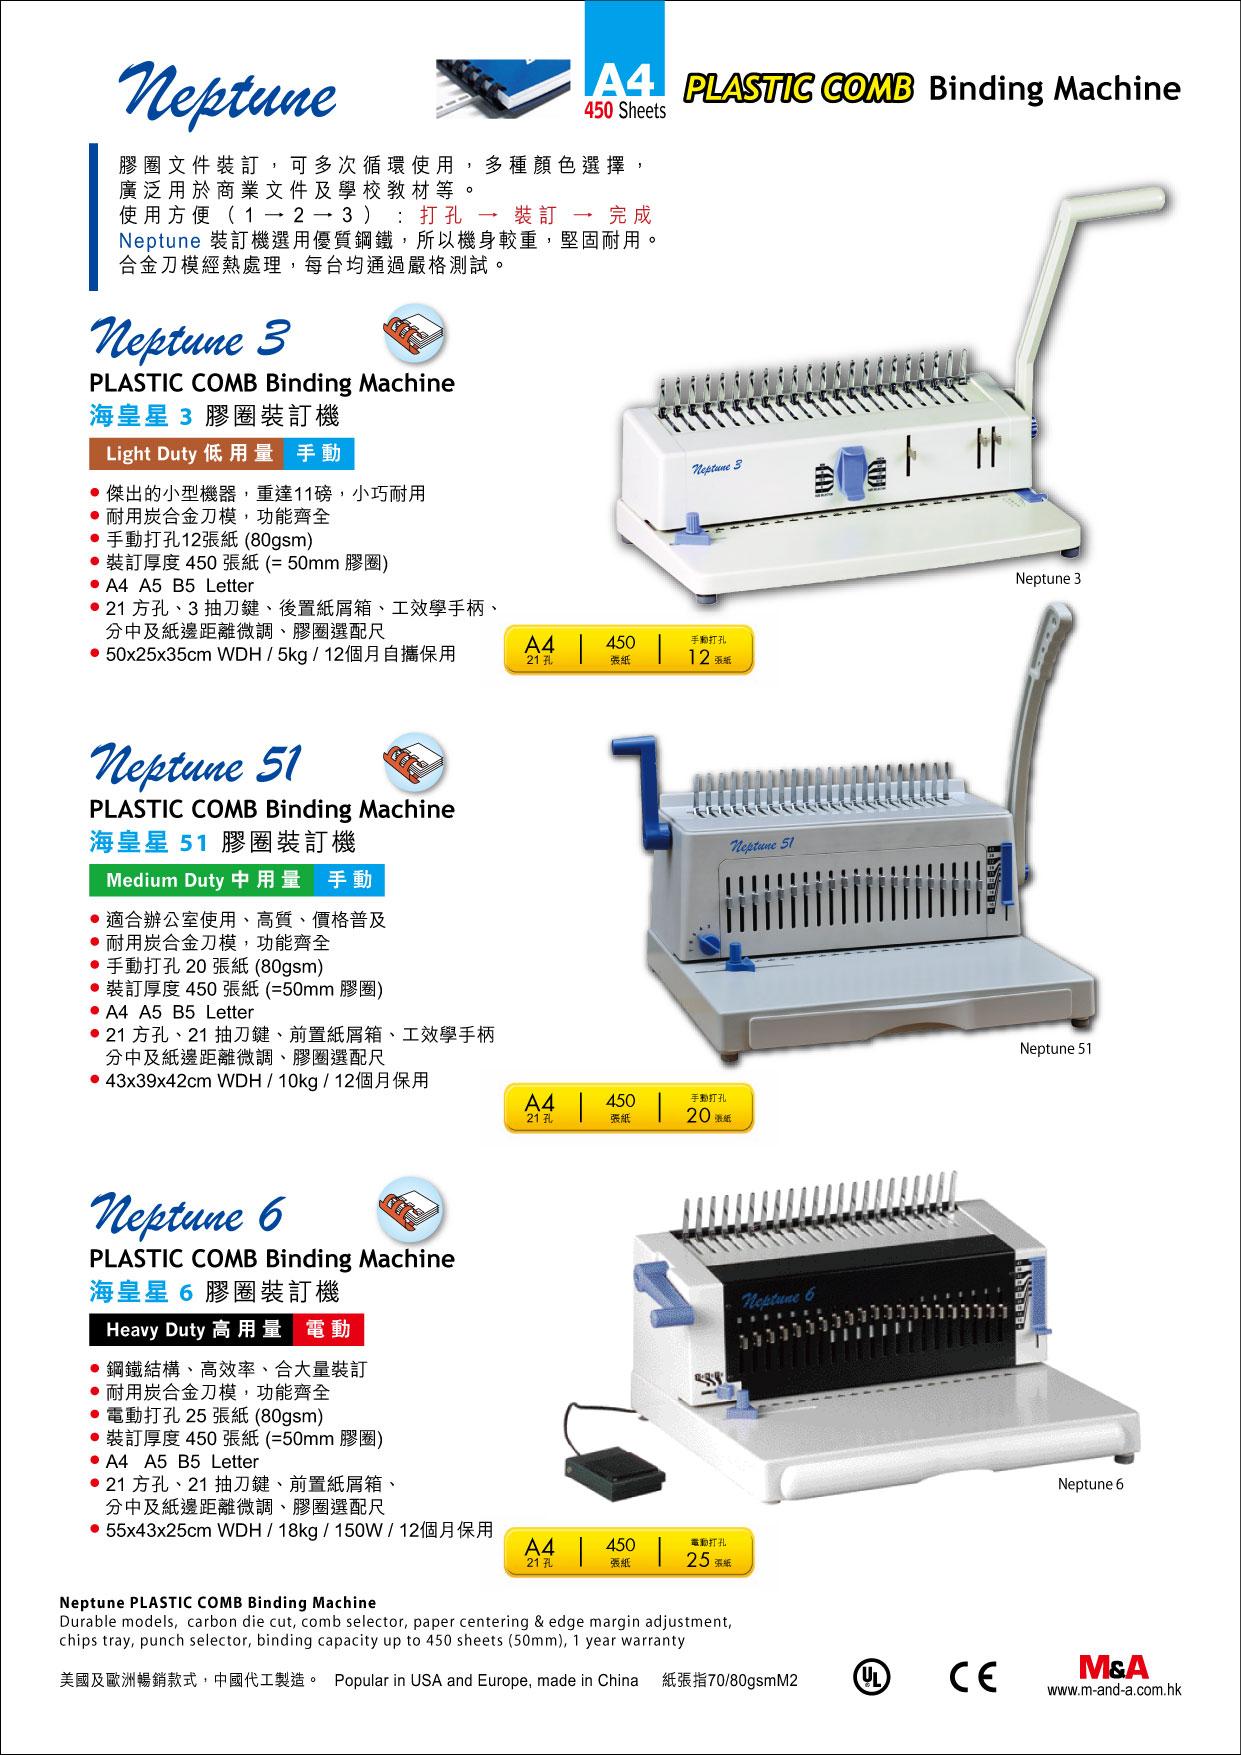 World Trade Office equipment sales & maintenance service since 1978 ...